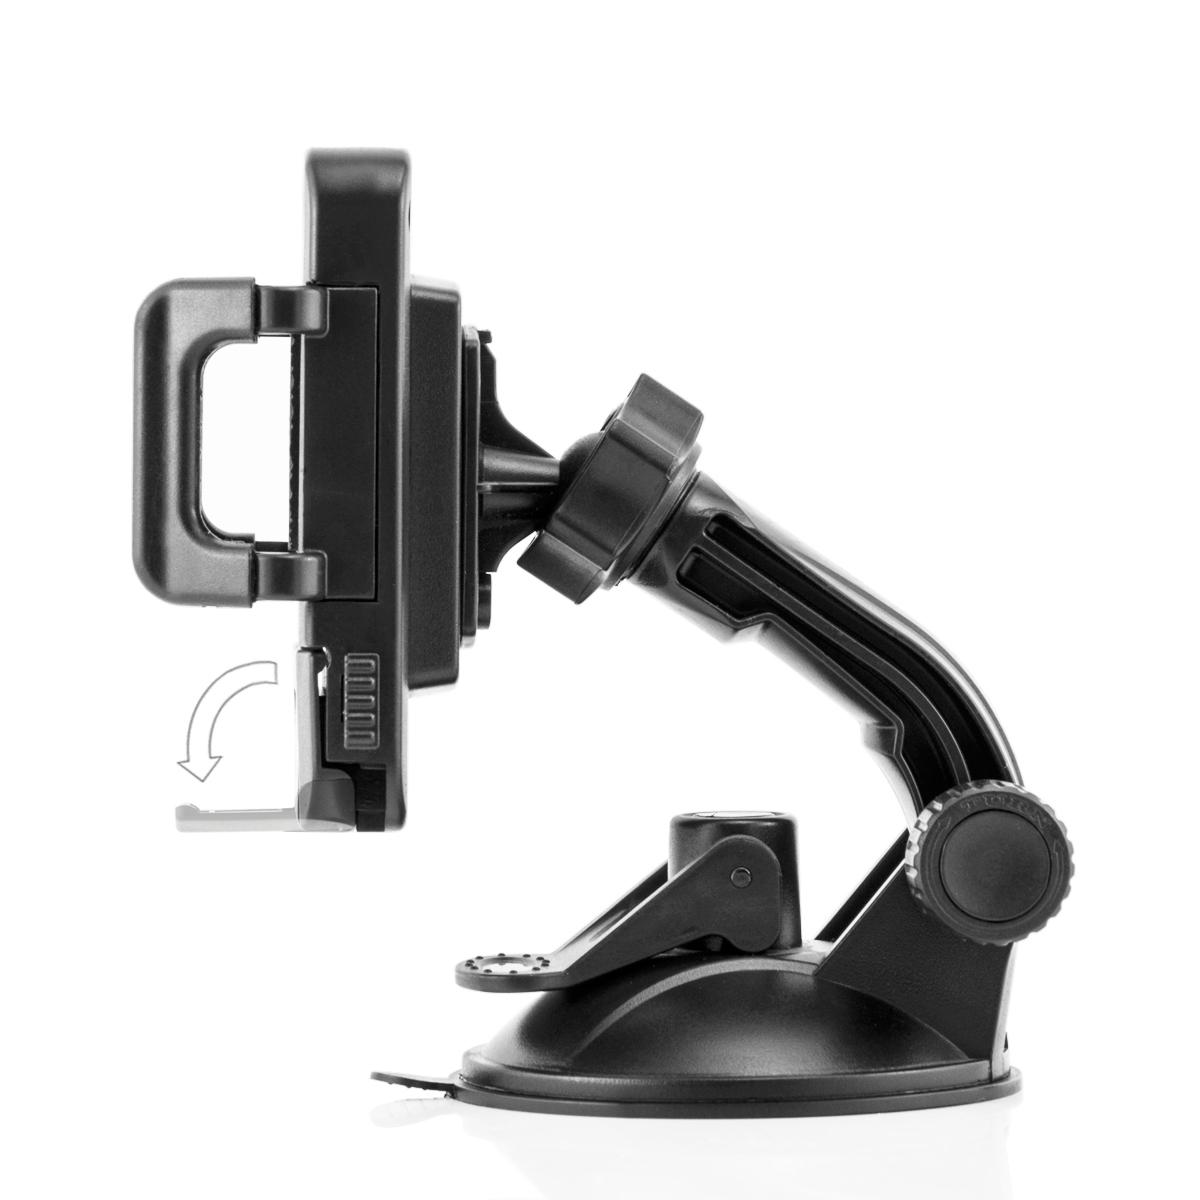 360 auto kfz handy halter halterung autohalter car holder. Black Bedroom Furniture Sets. Home Design Ideas